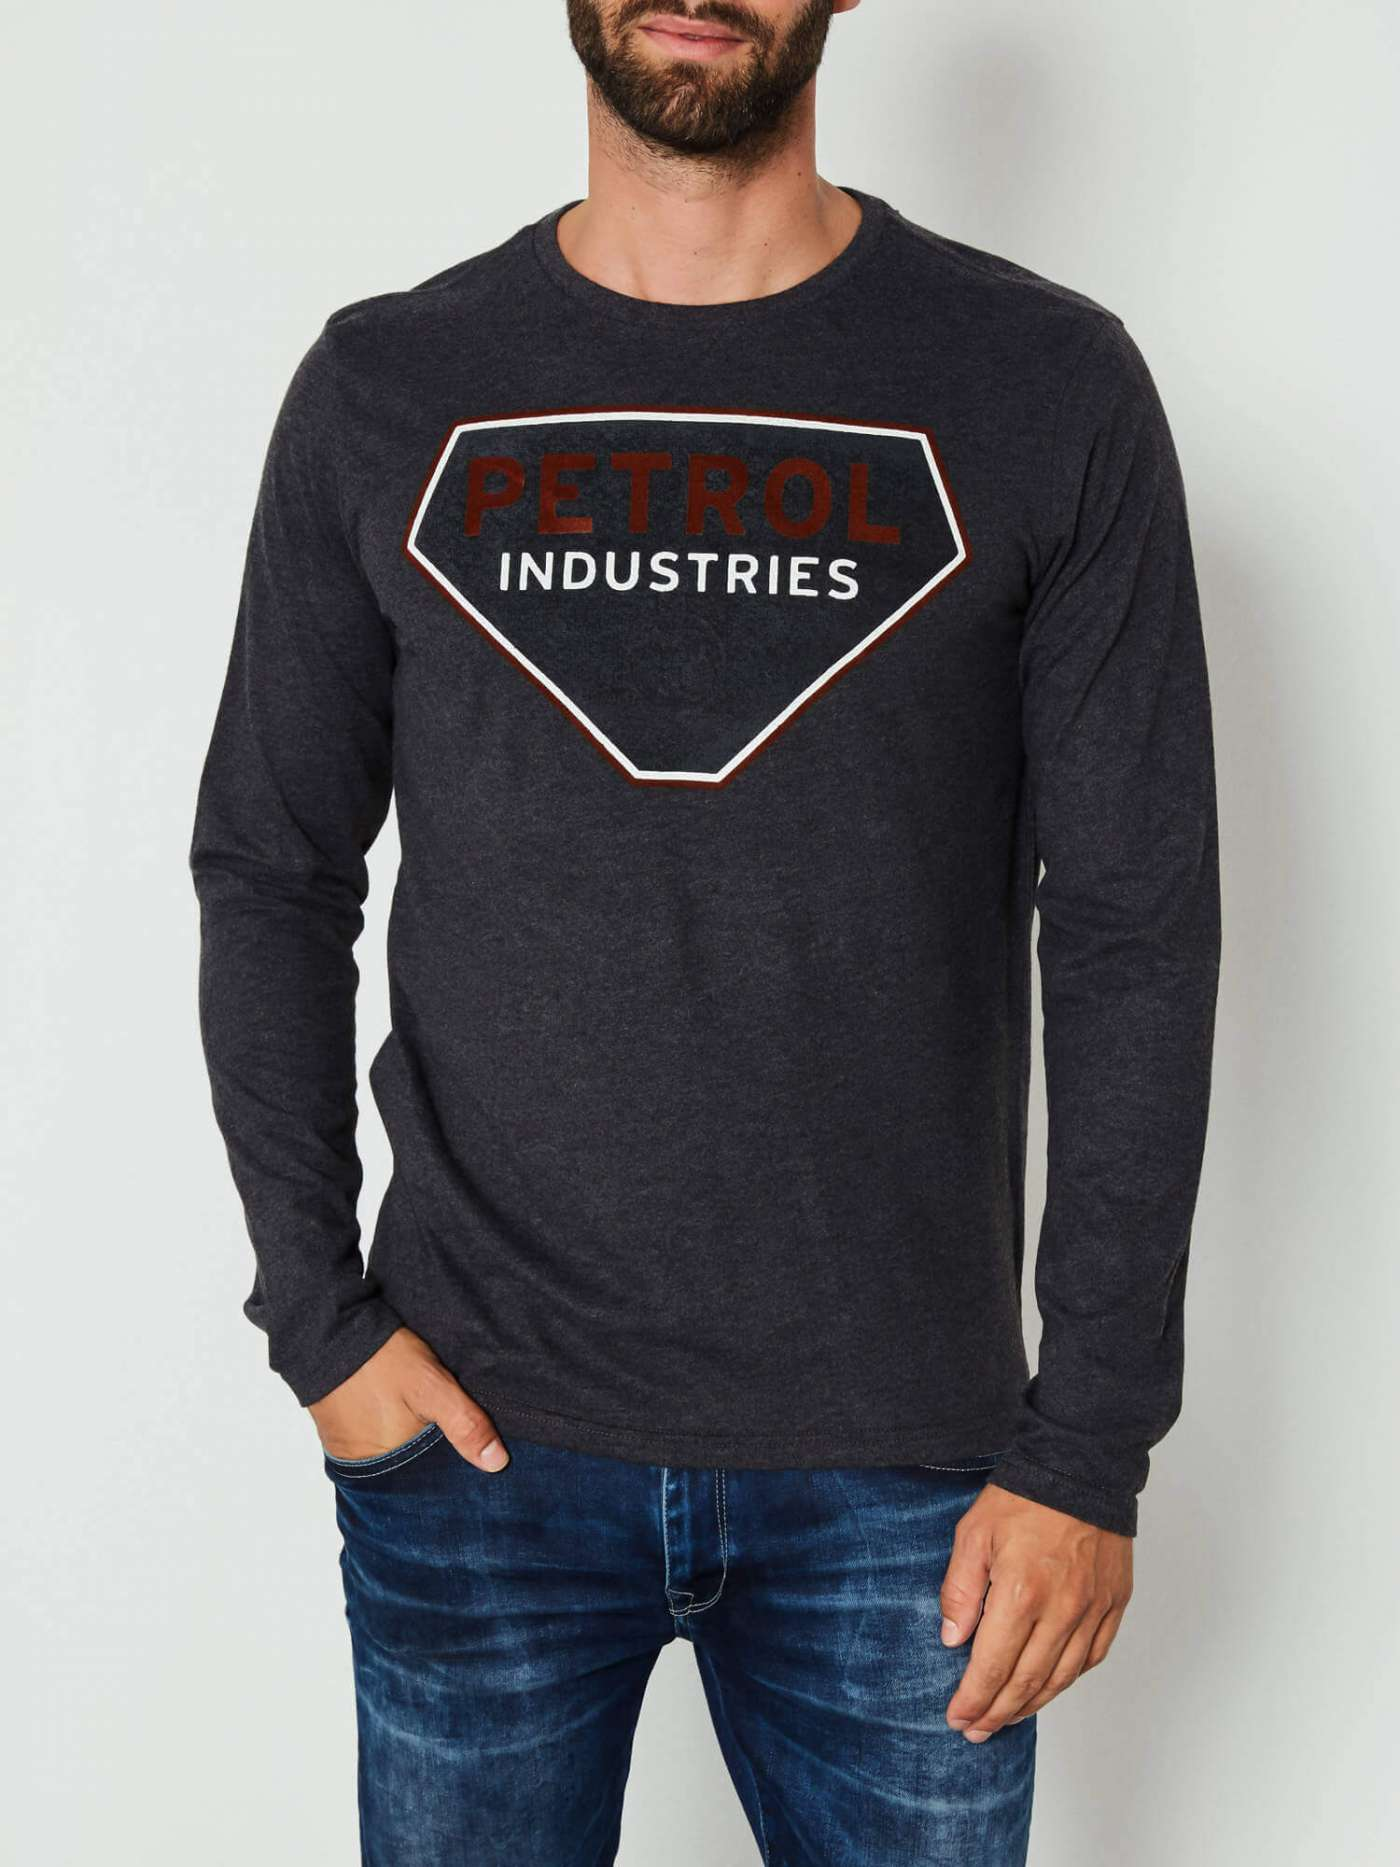 Tee shirt manche longue gris Petrol Industries